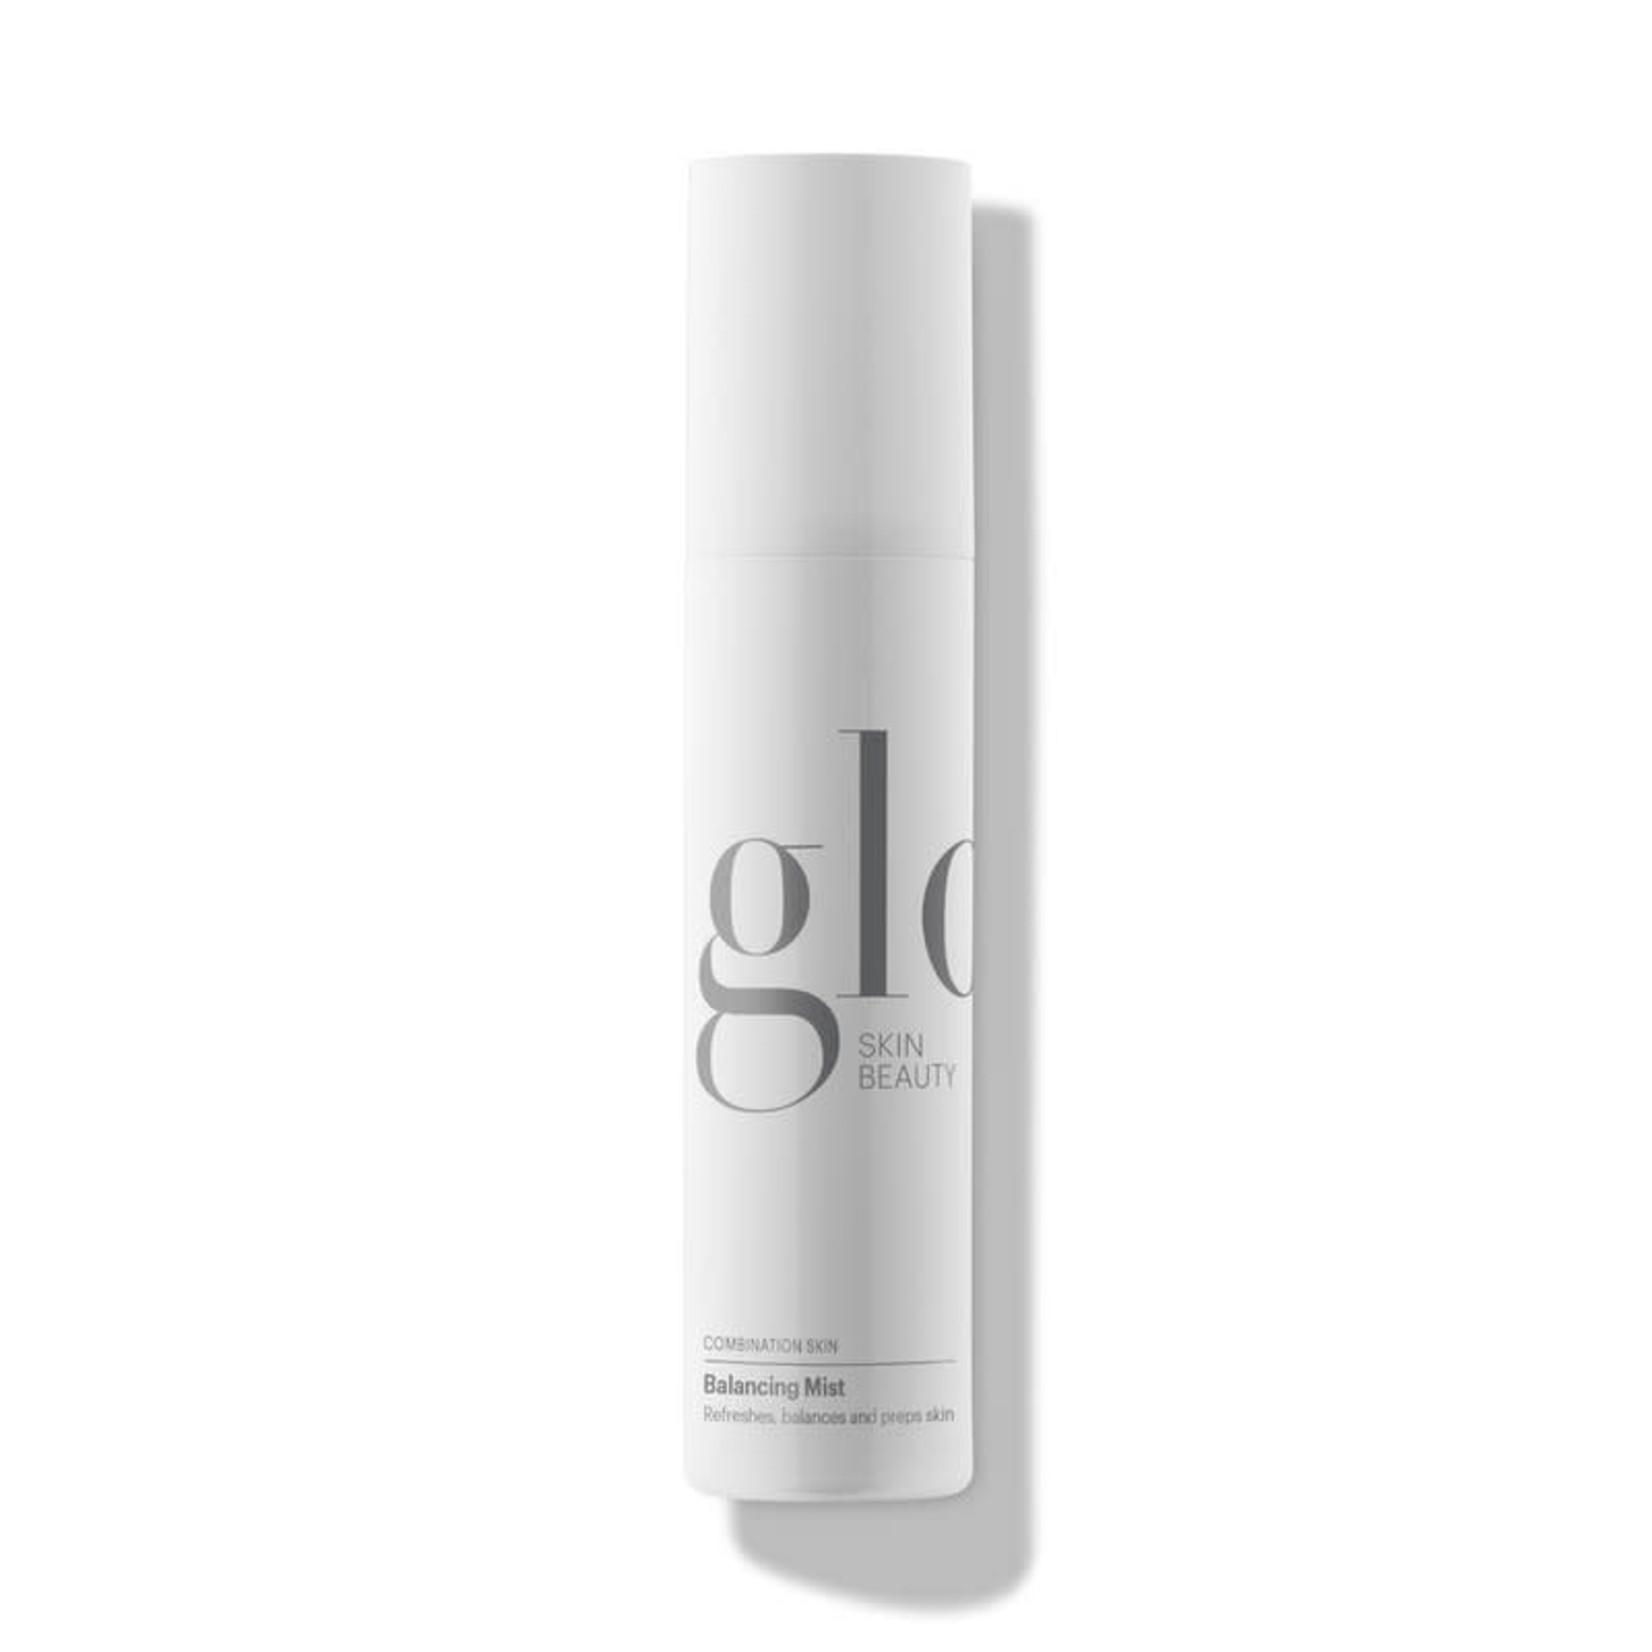 Glo Skin Beauty Balancing Mist